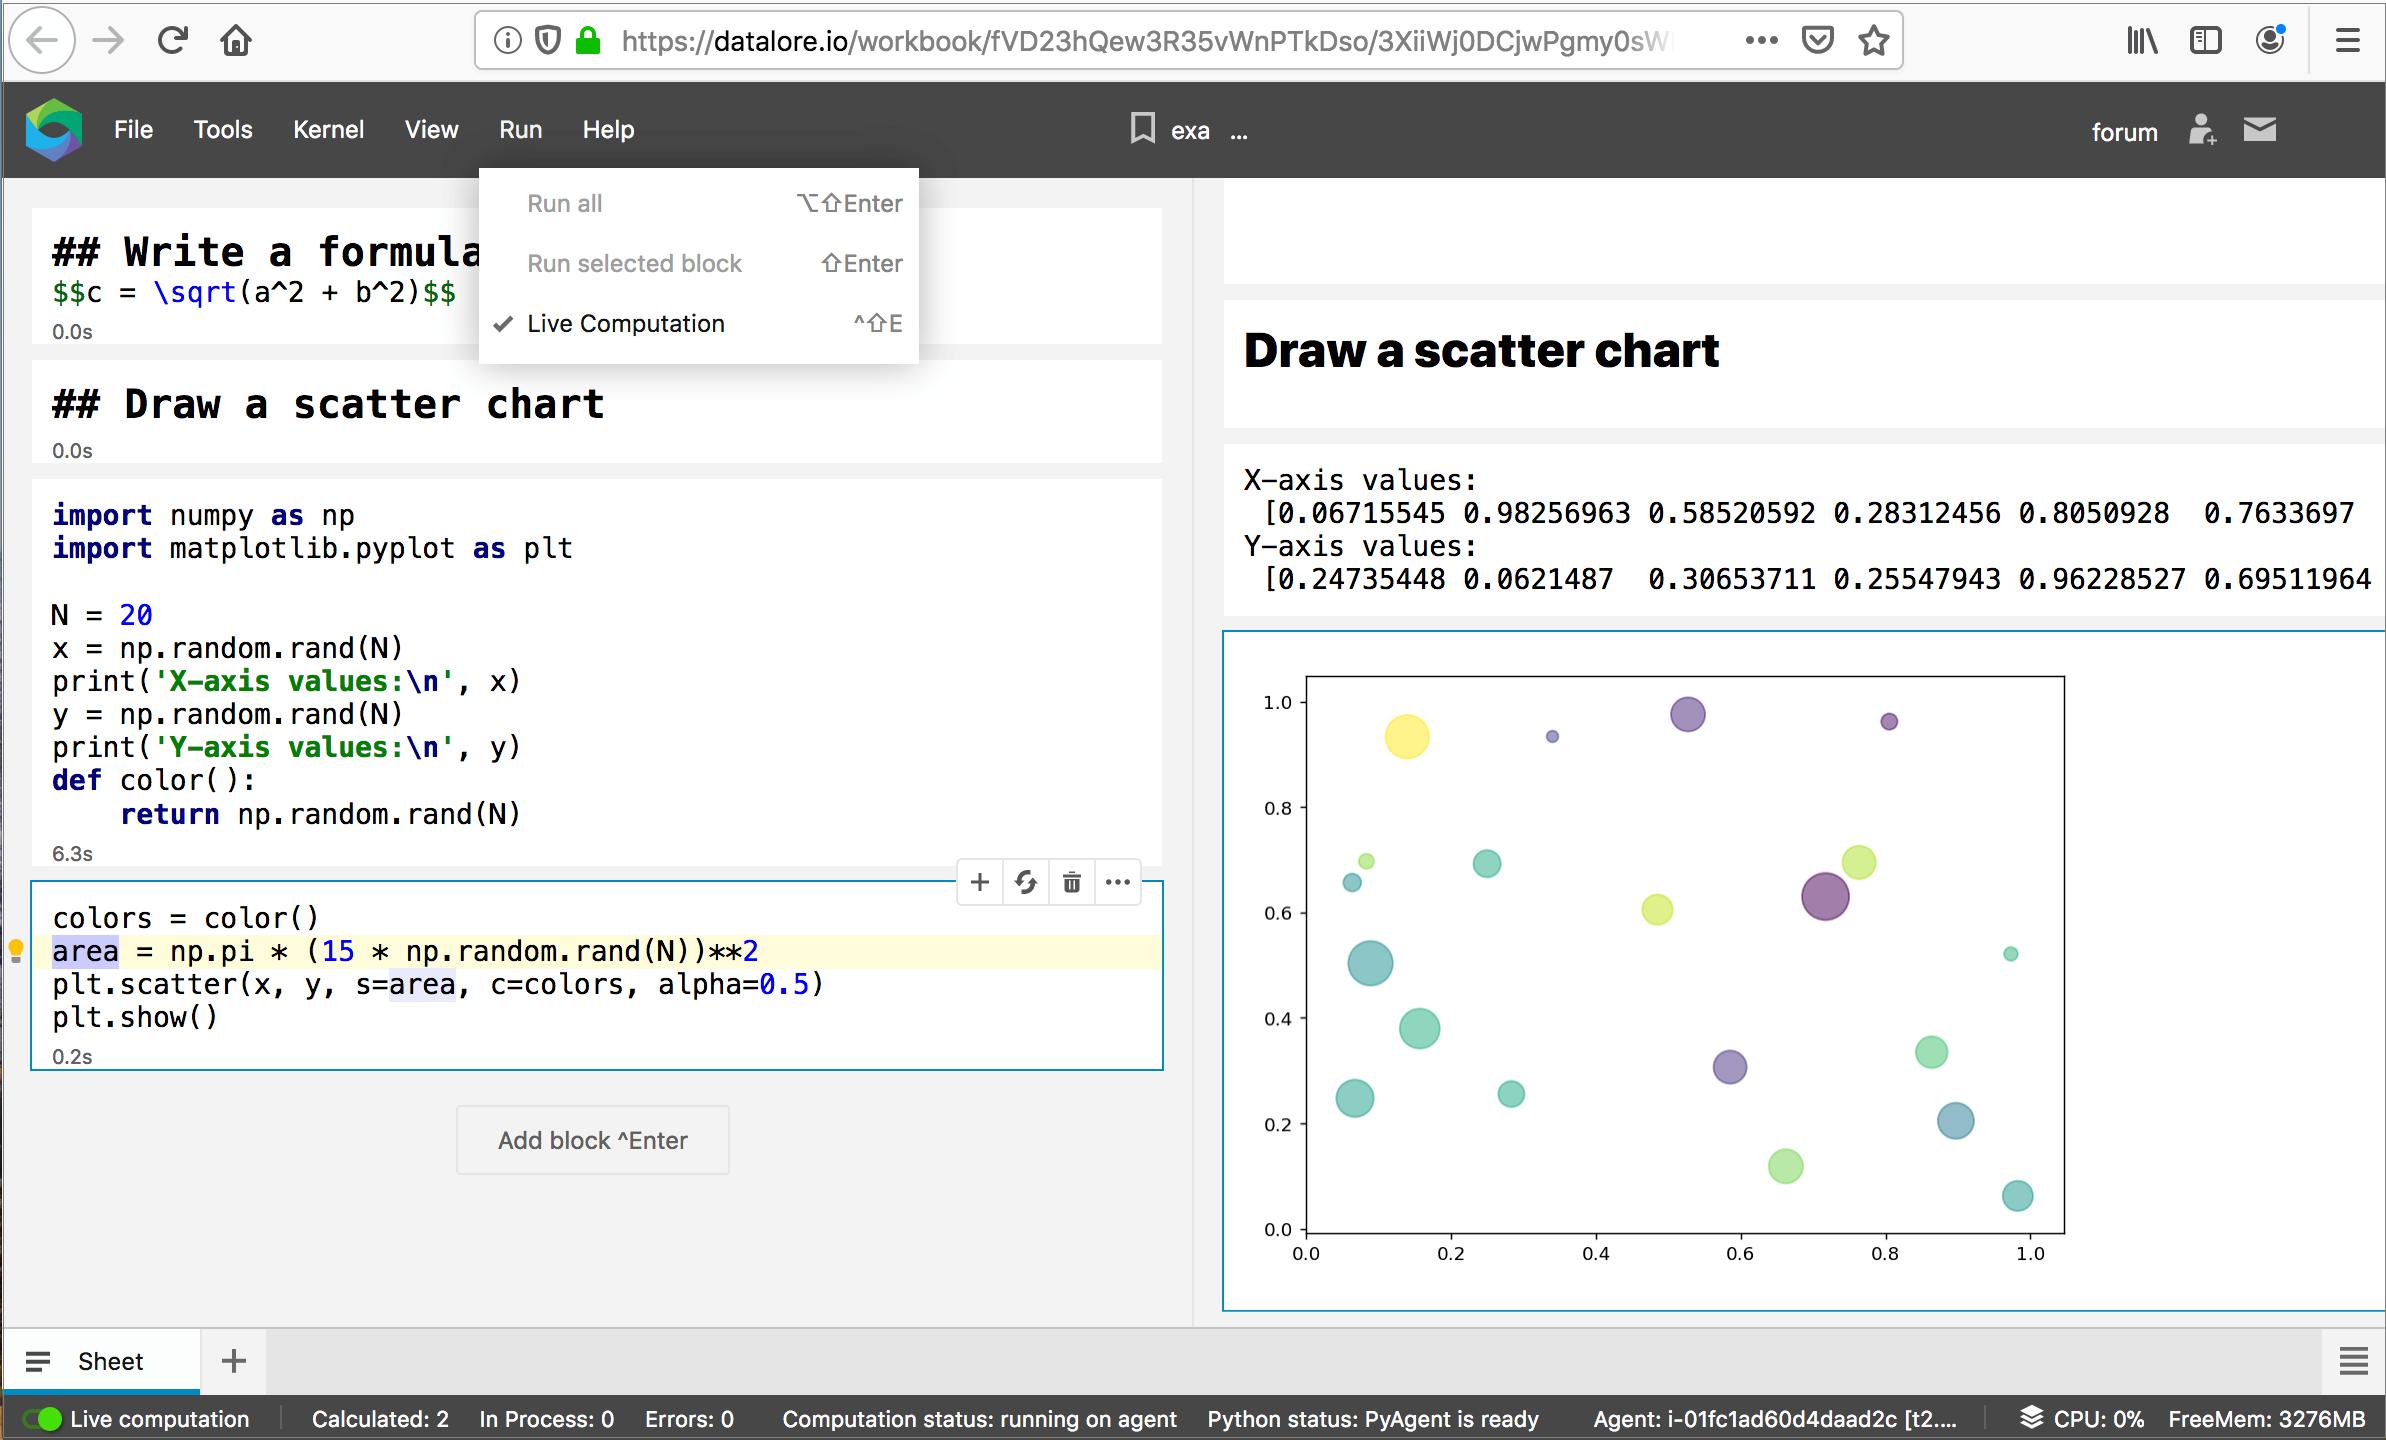 py_datalore_run_notebook